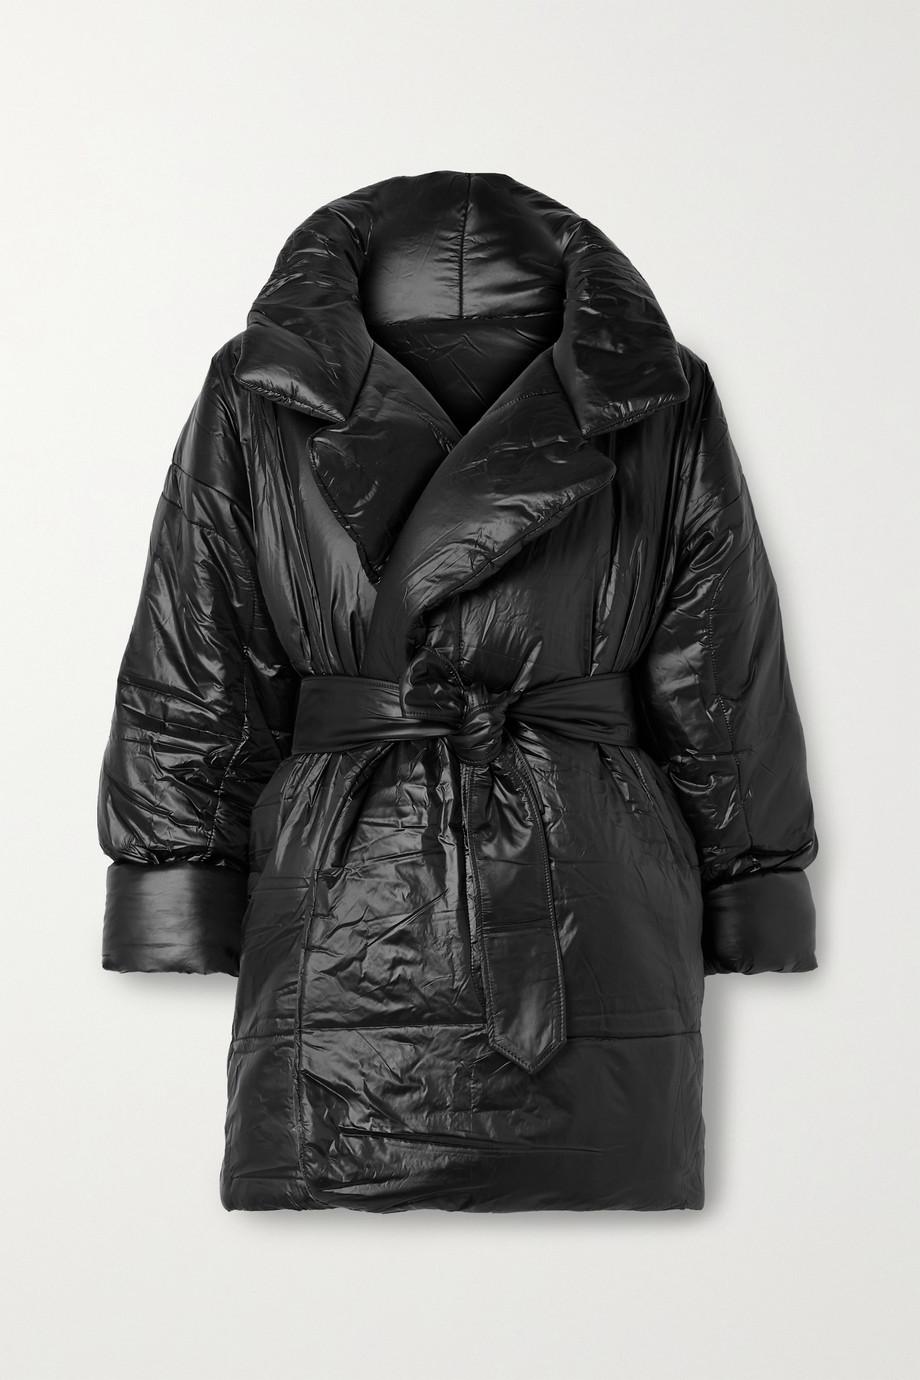 Norma Kamali Sleeping Bag oversized belted shell coat